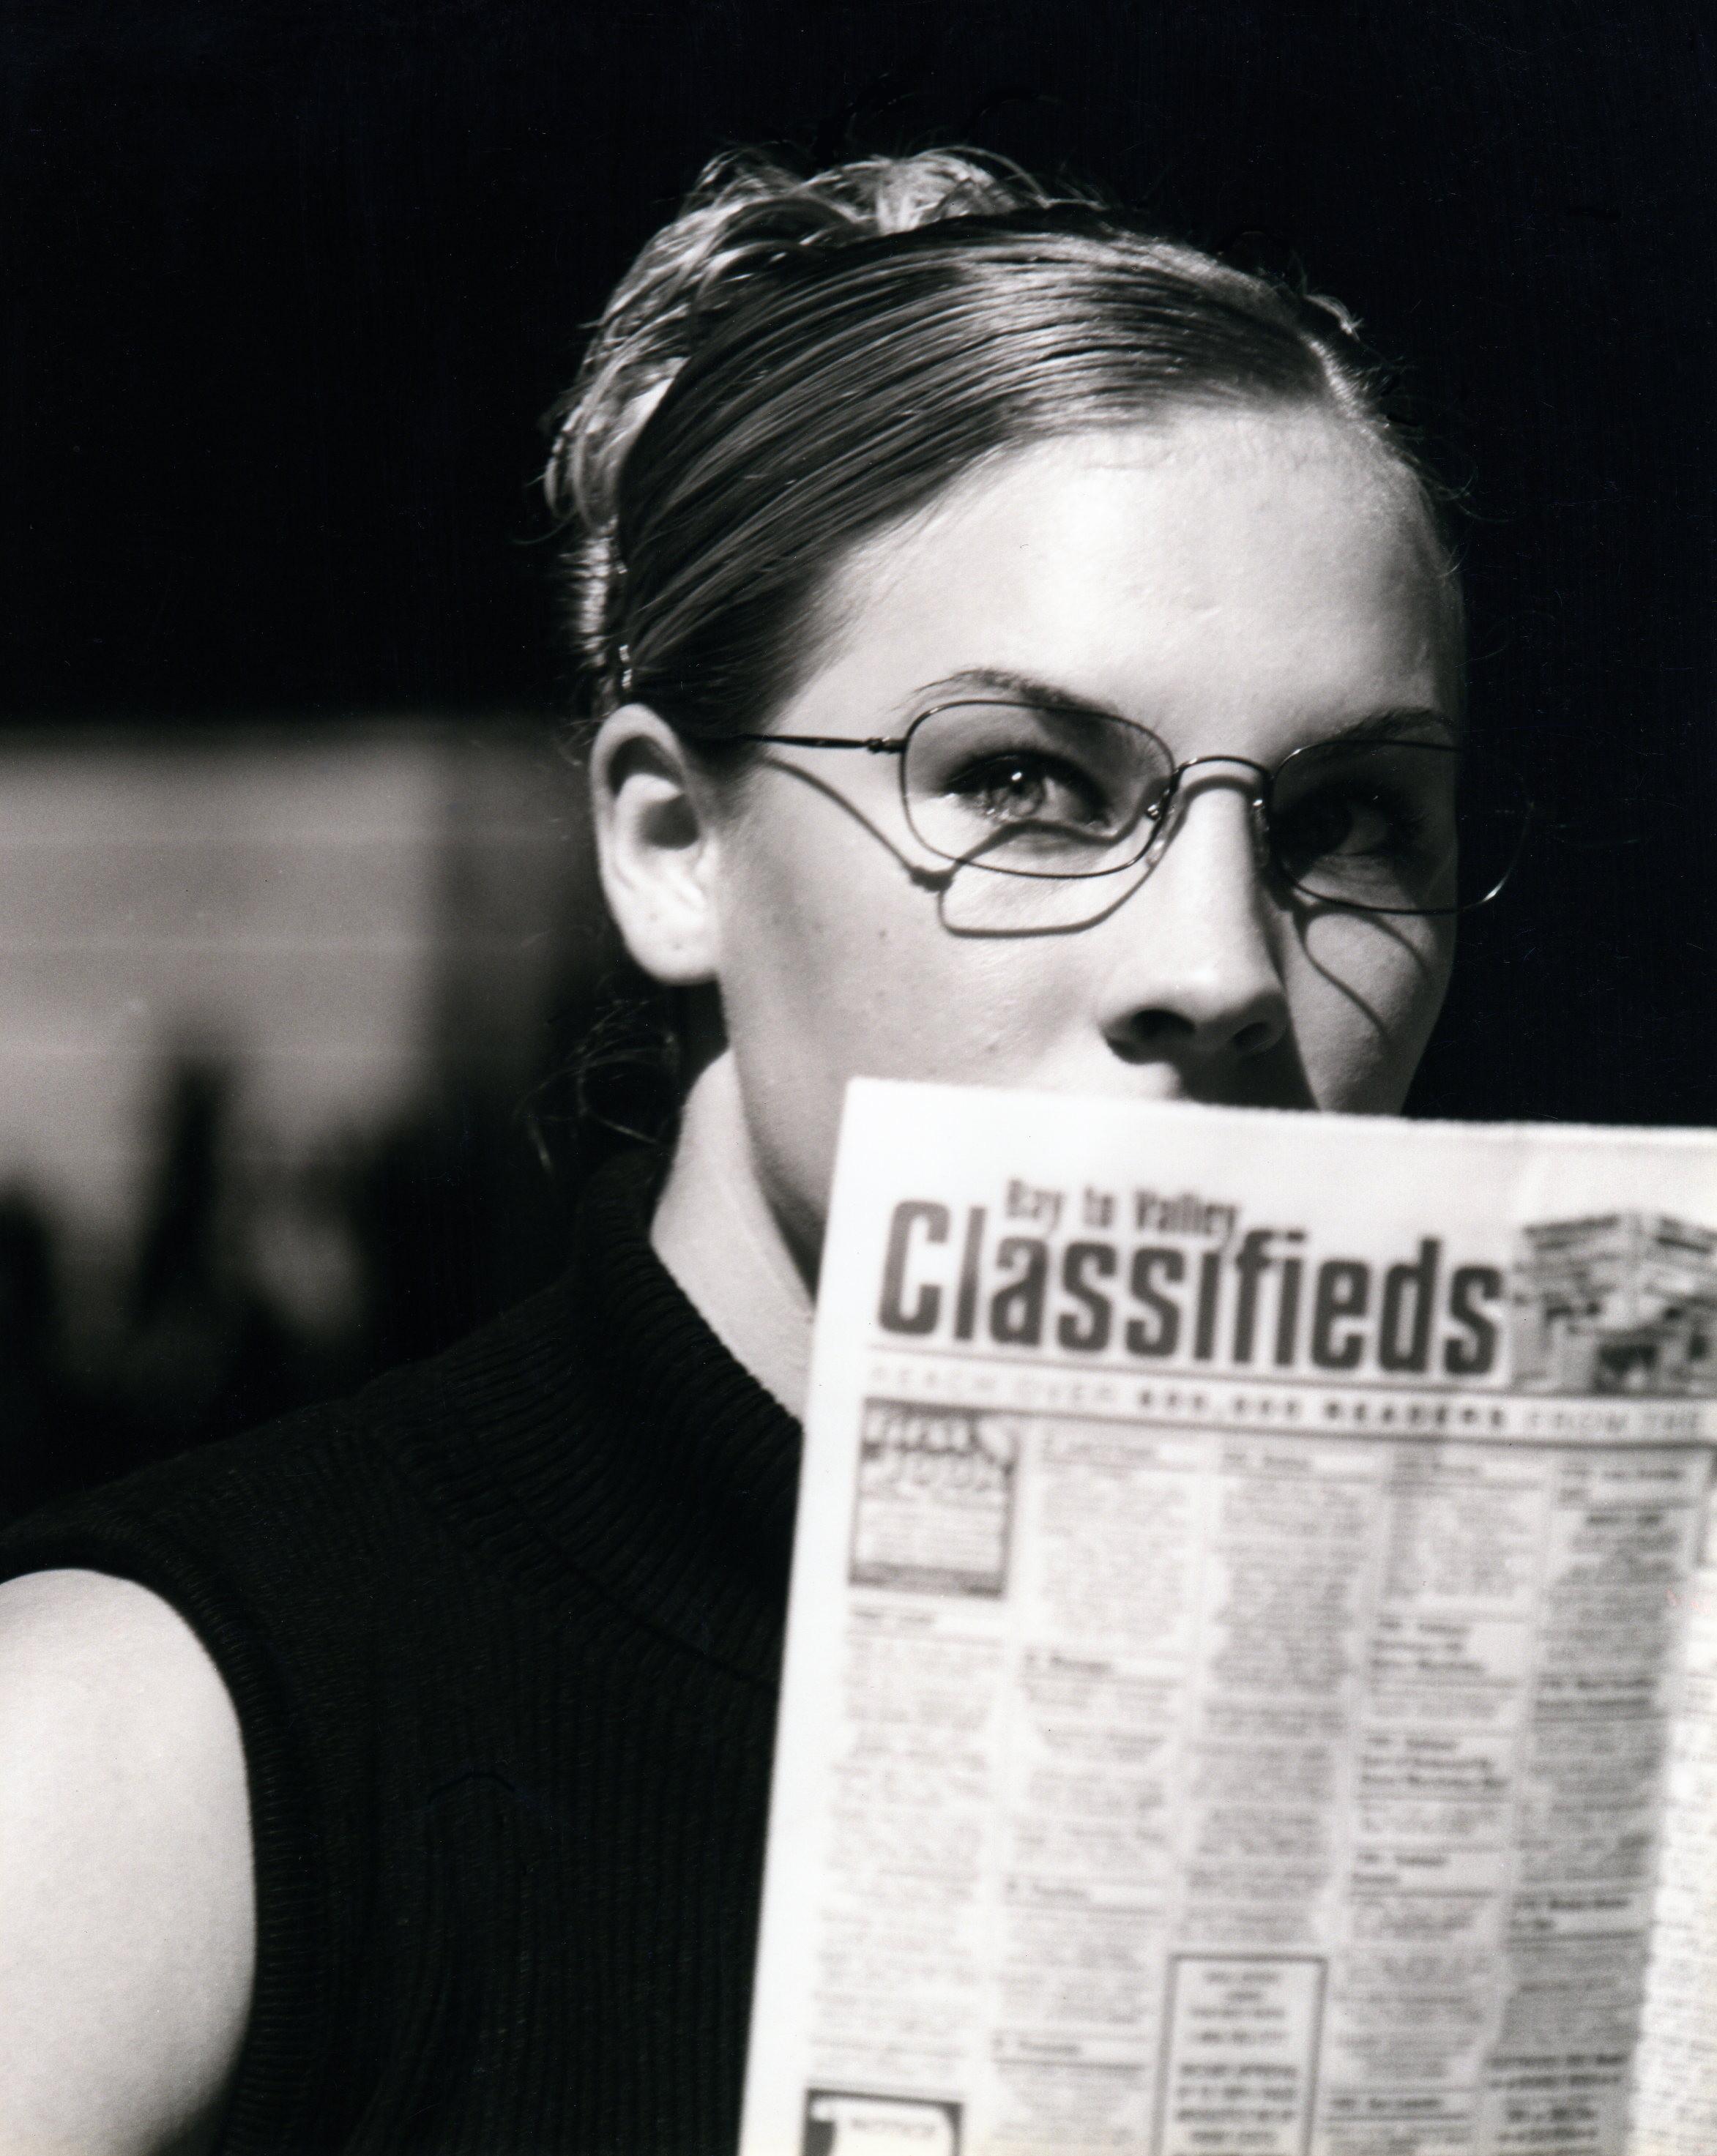 Classifieds1